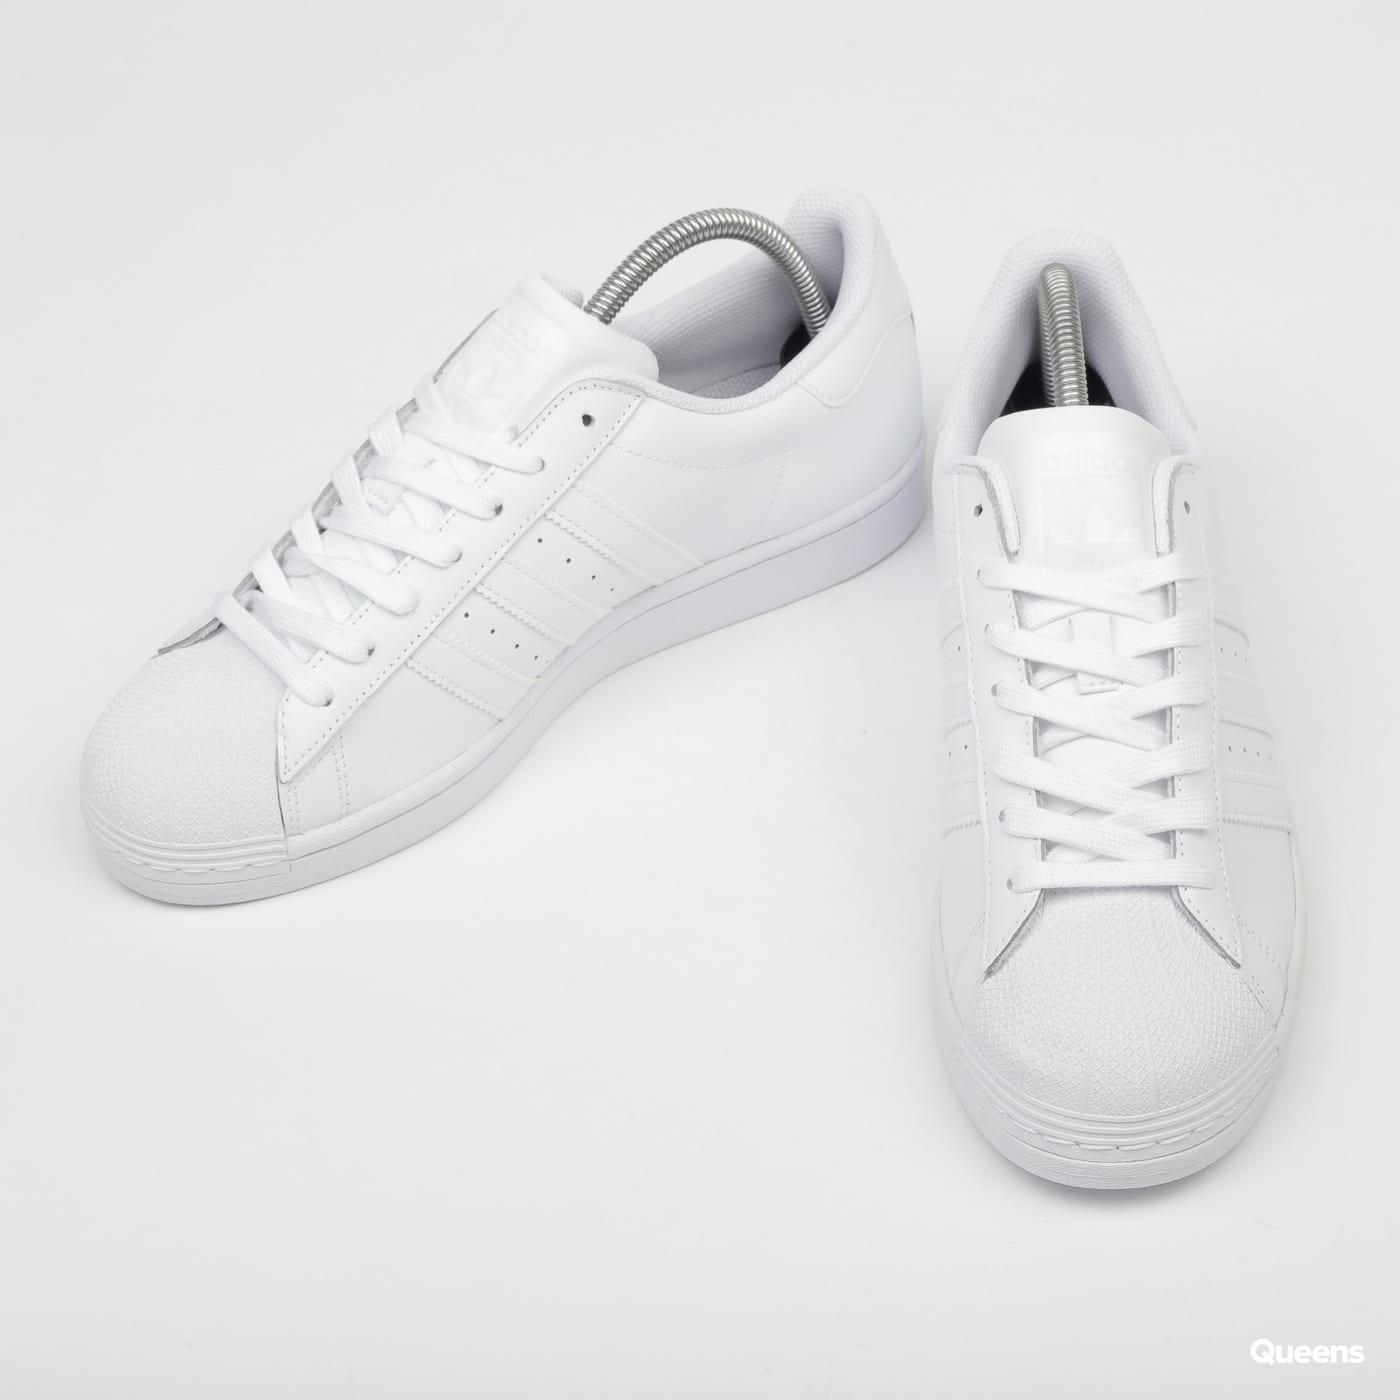 adidas Originals Superstar ftwwht / ftwwht / ftwwht